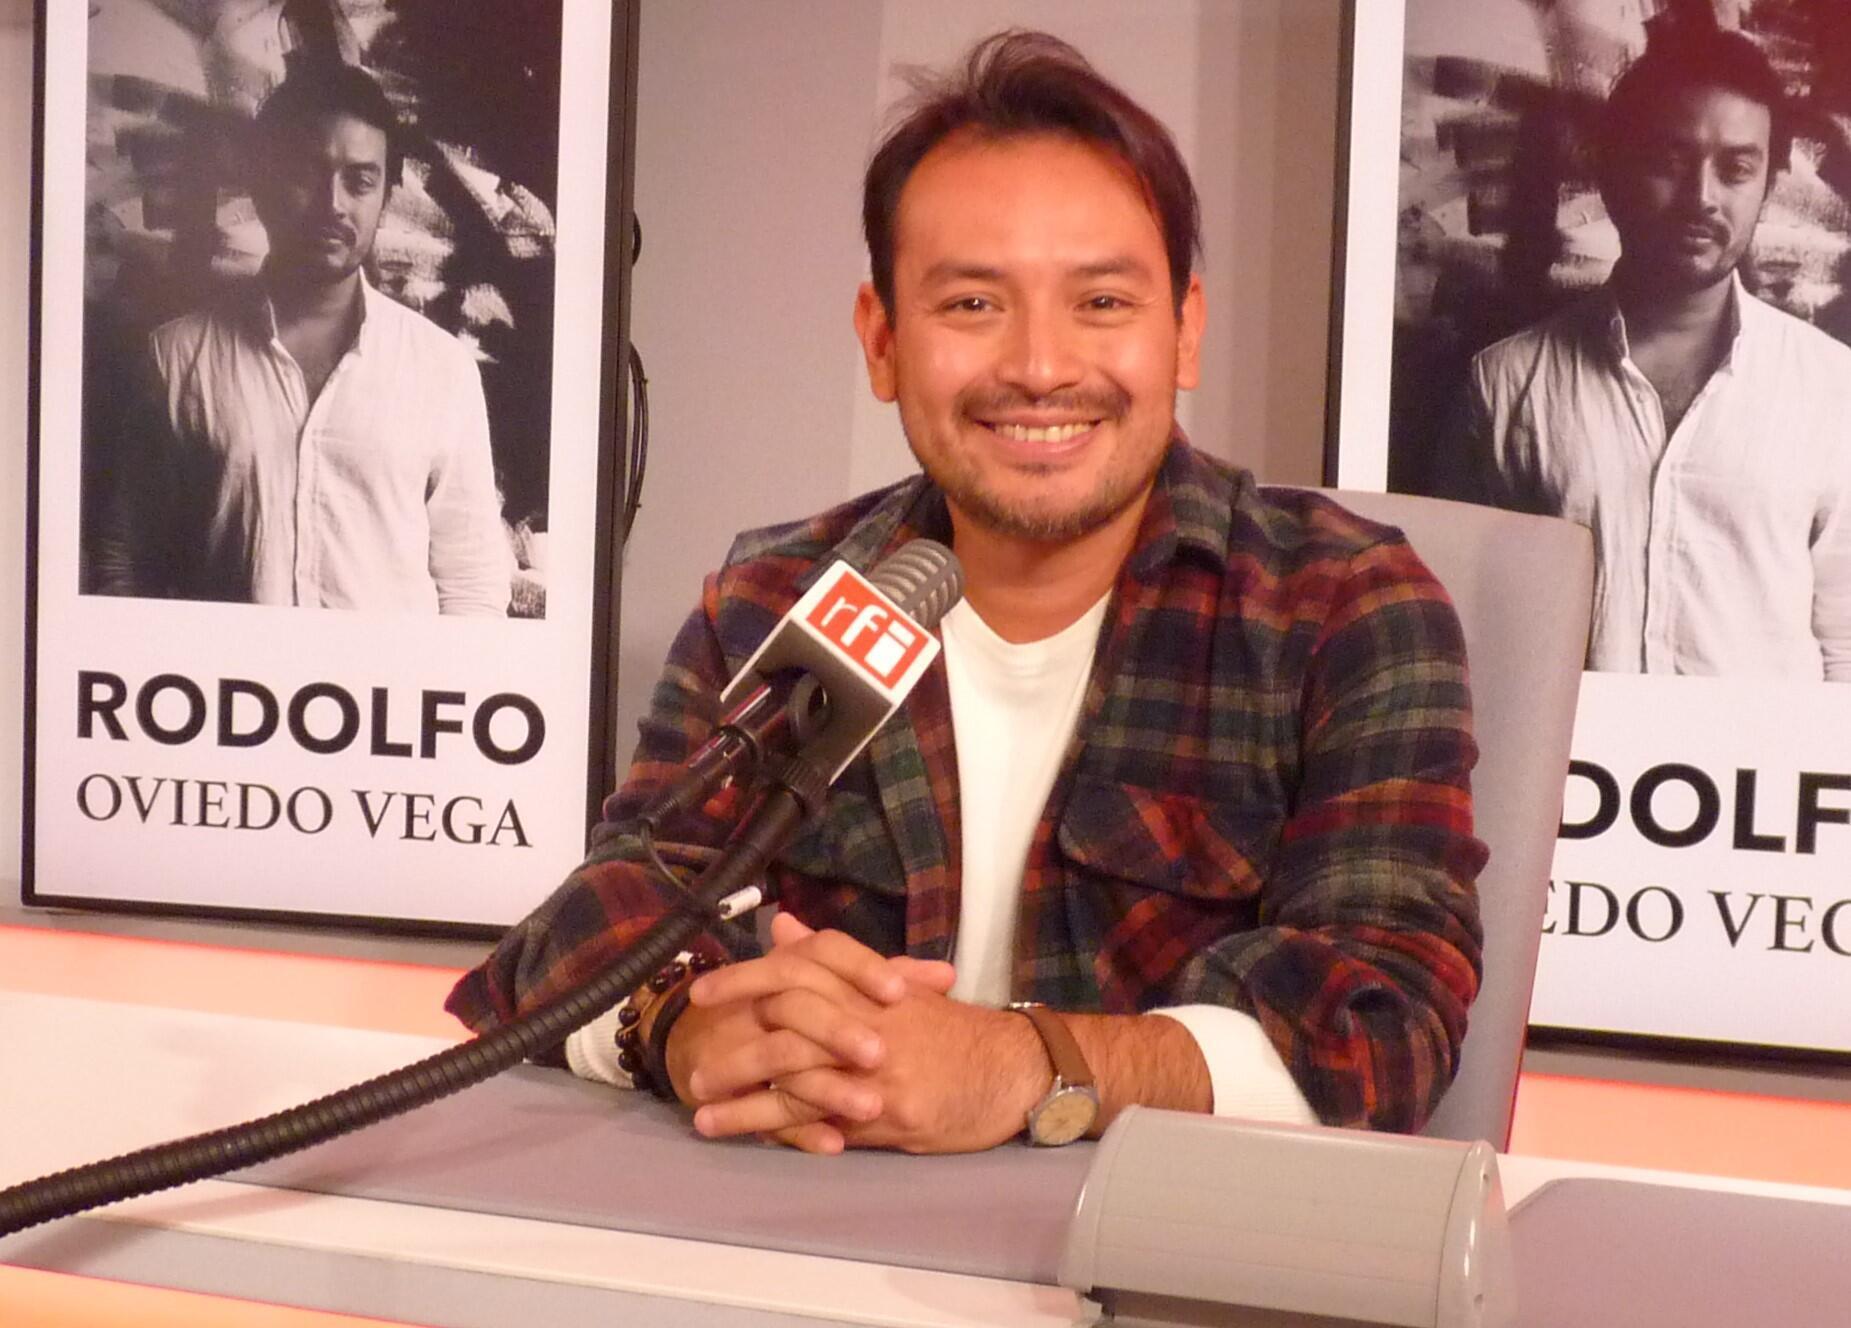 El artista salvadoreño Rodolfo Oviedo Vega en RFI